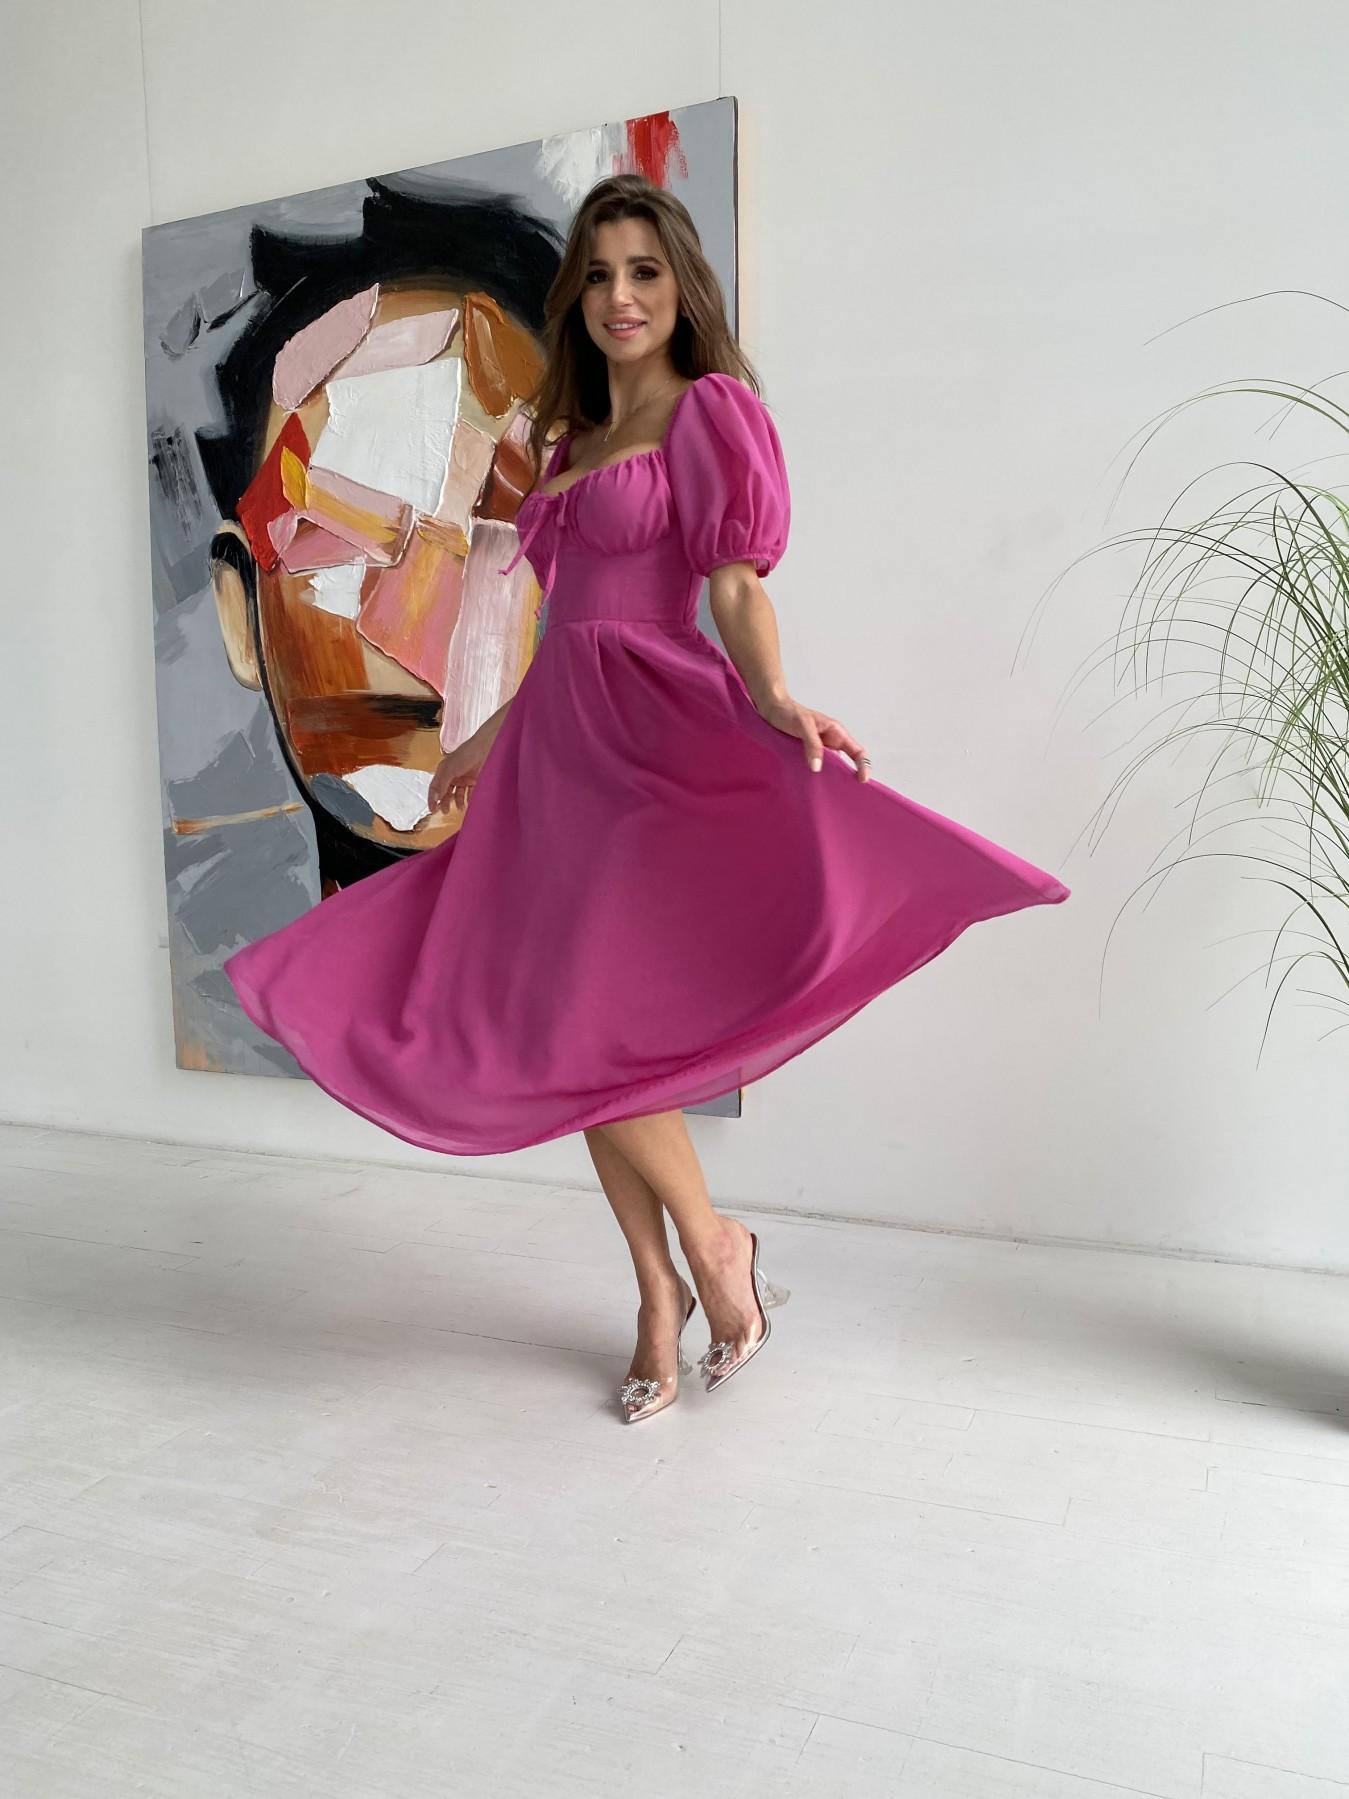 Кисес Миди платье шифон Микро однотонный 11603 АРТ. 48282 Цвет: Фуксия 16 - фото 1, интернет магазин tm-modus.ru